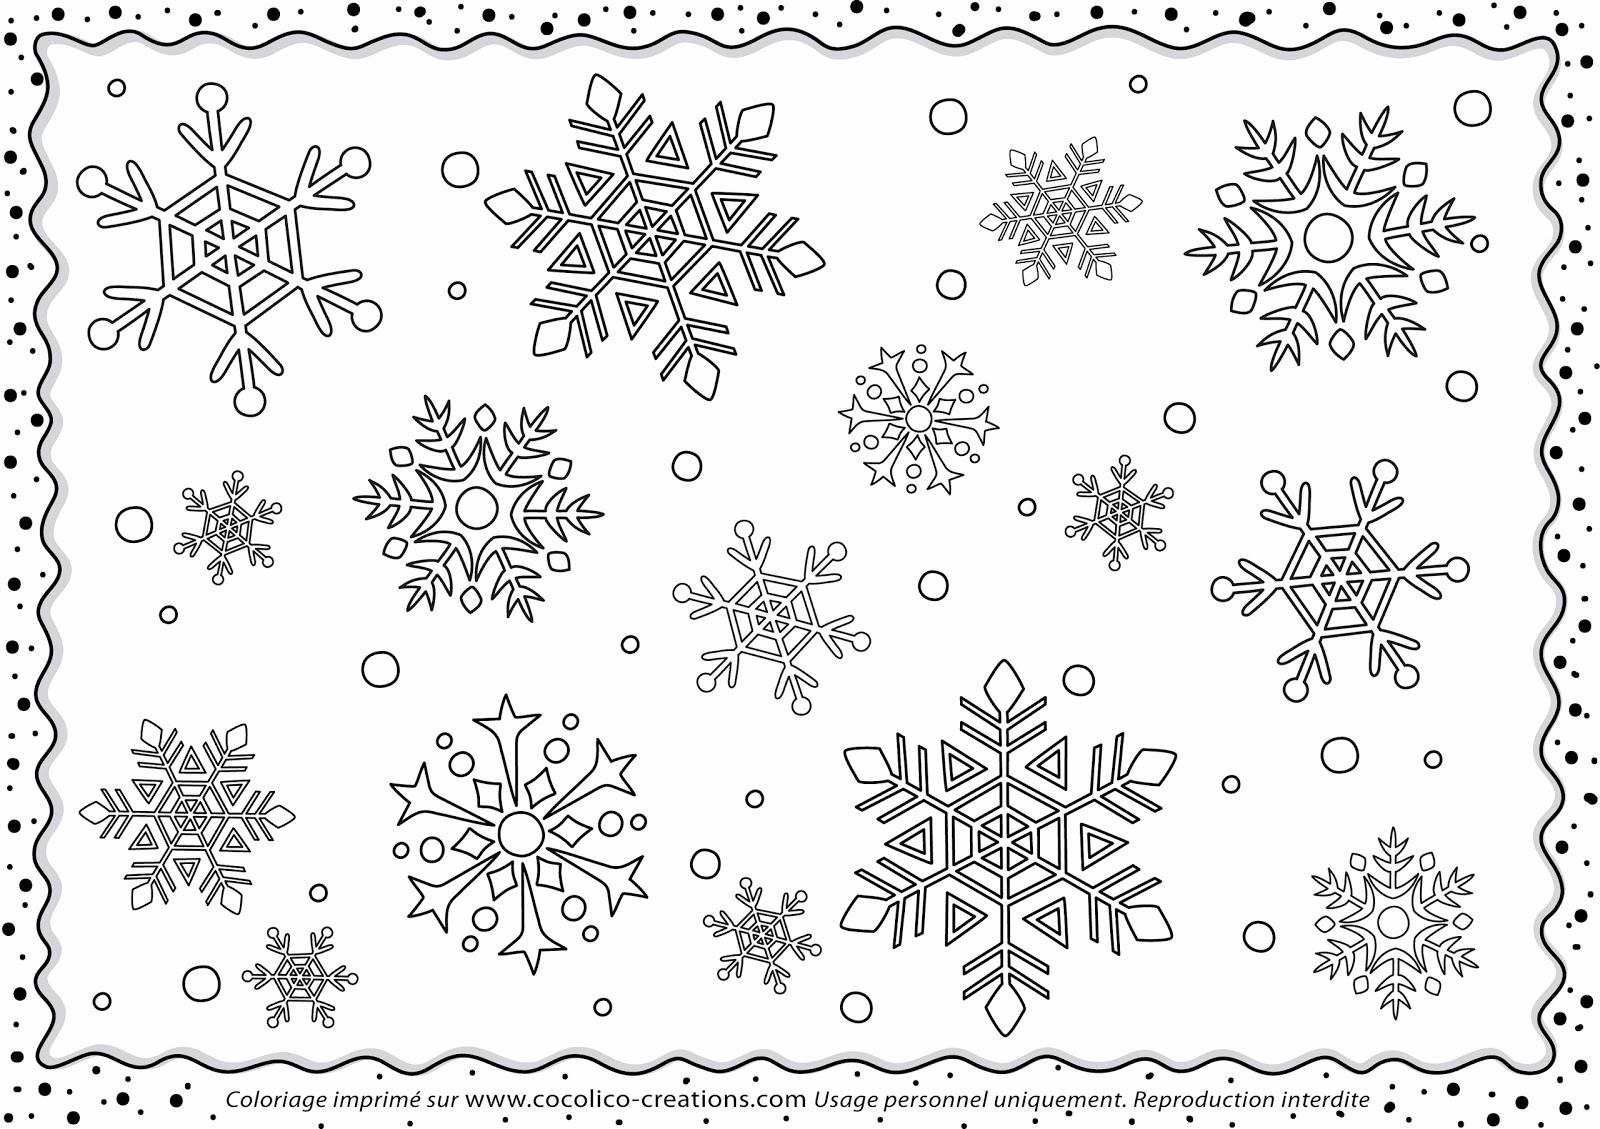 Cocolico creations mercredi coloriage 20 flocons de - Dessin de neige ...